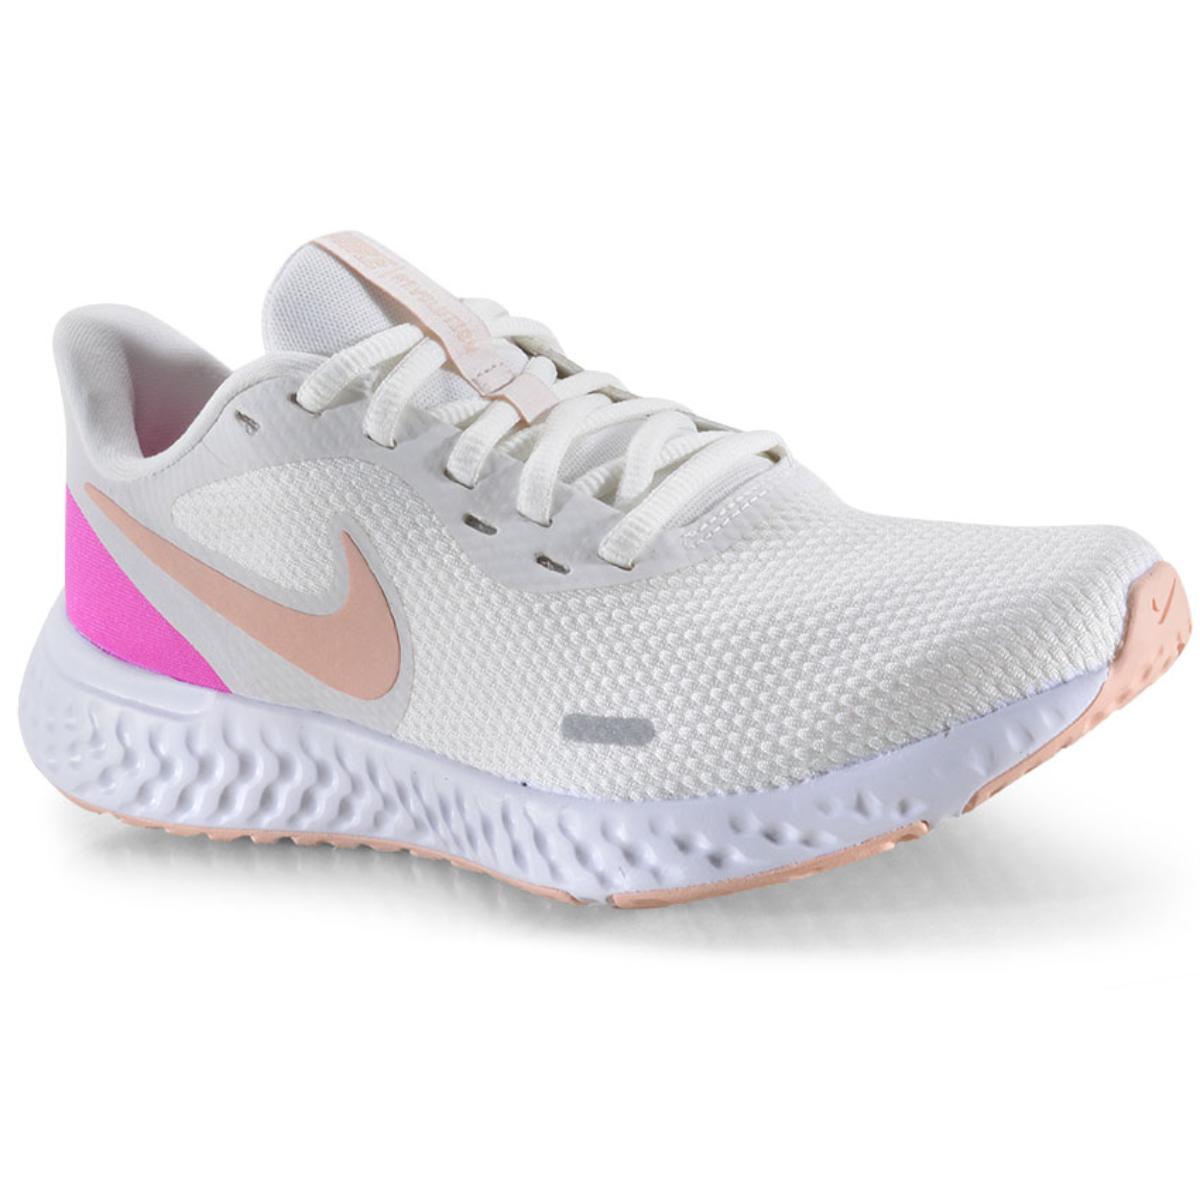 Tênis Feminino Nike Bq3207-103 Revolution 5 Branco/pink